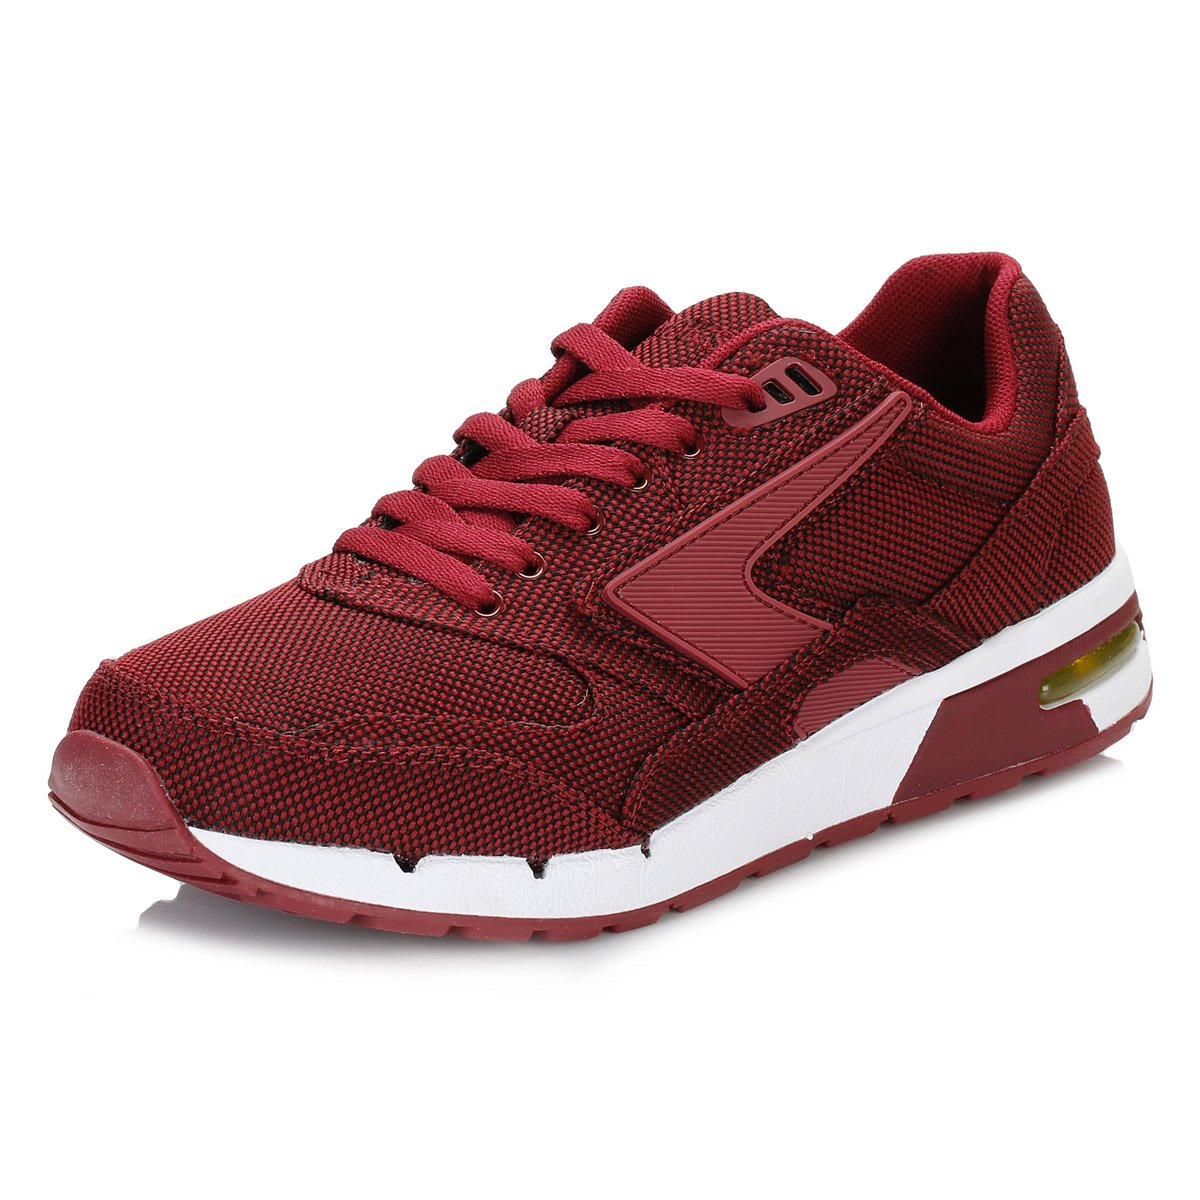 4bc042e7dde Brooks Mens Syrah Academia Fusion Trainers  Amazon.co.uk  Shoes   Bags